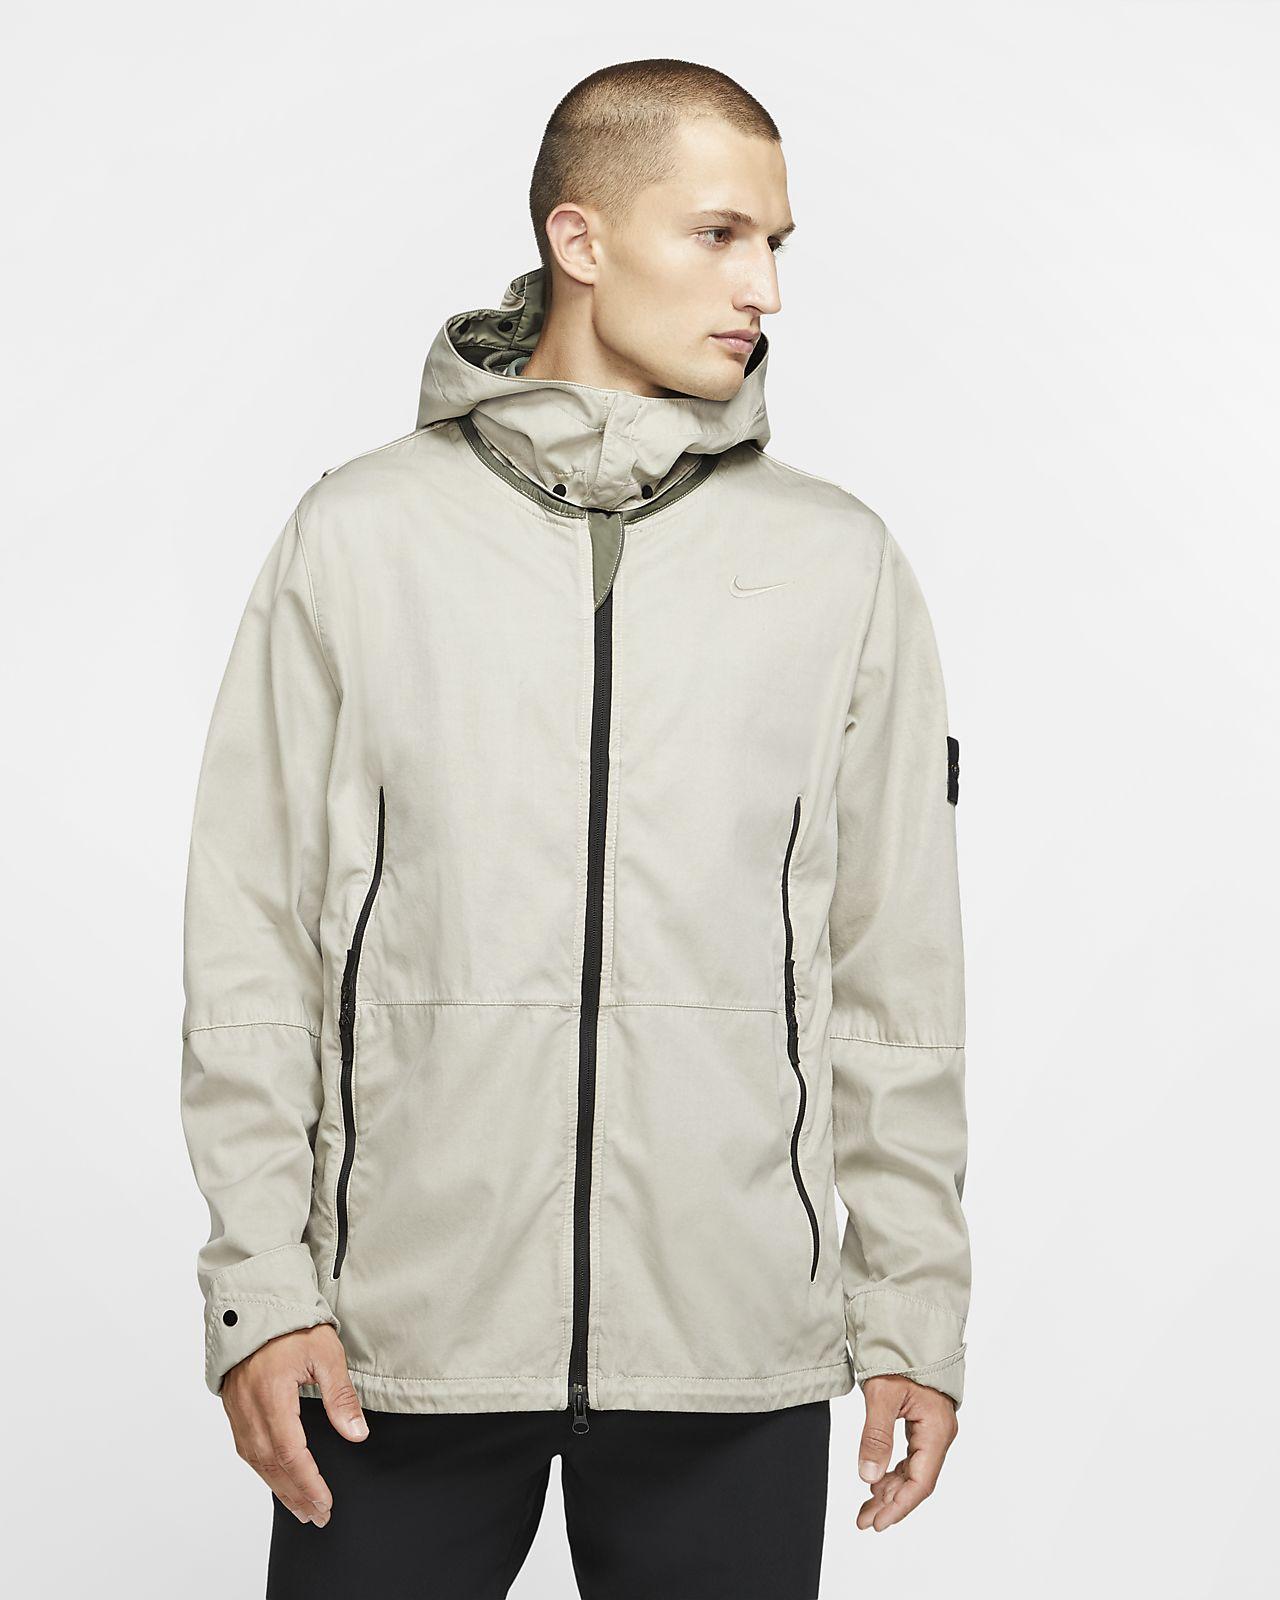 Nike x Stone Island Men's Golf Jacket